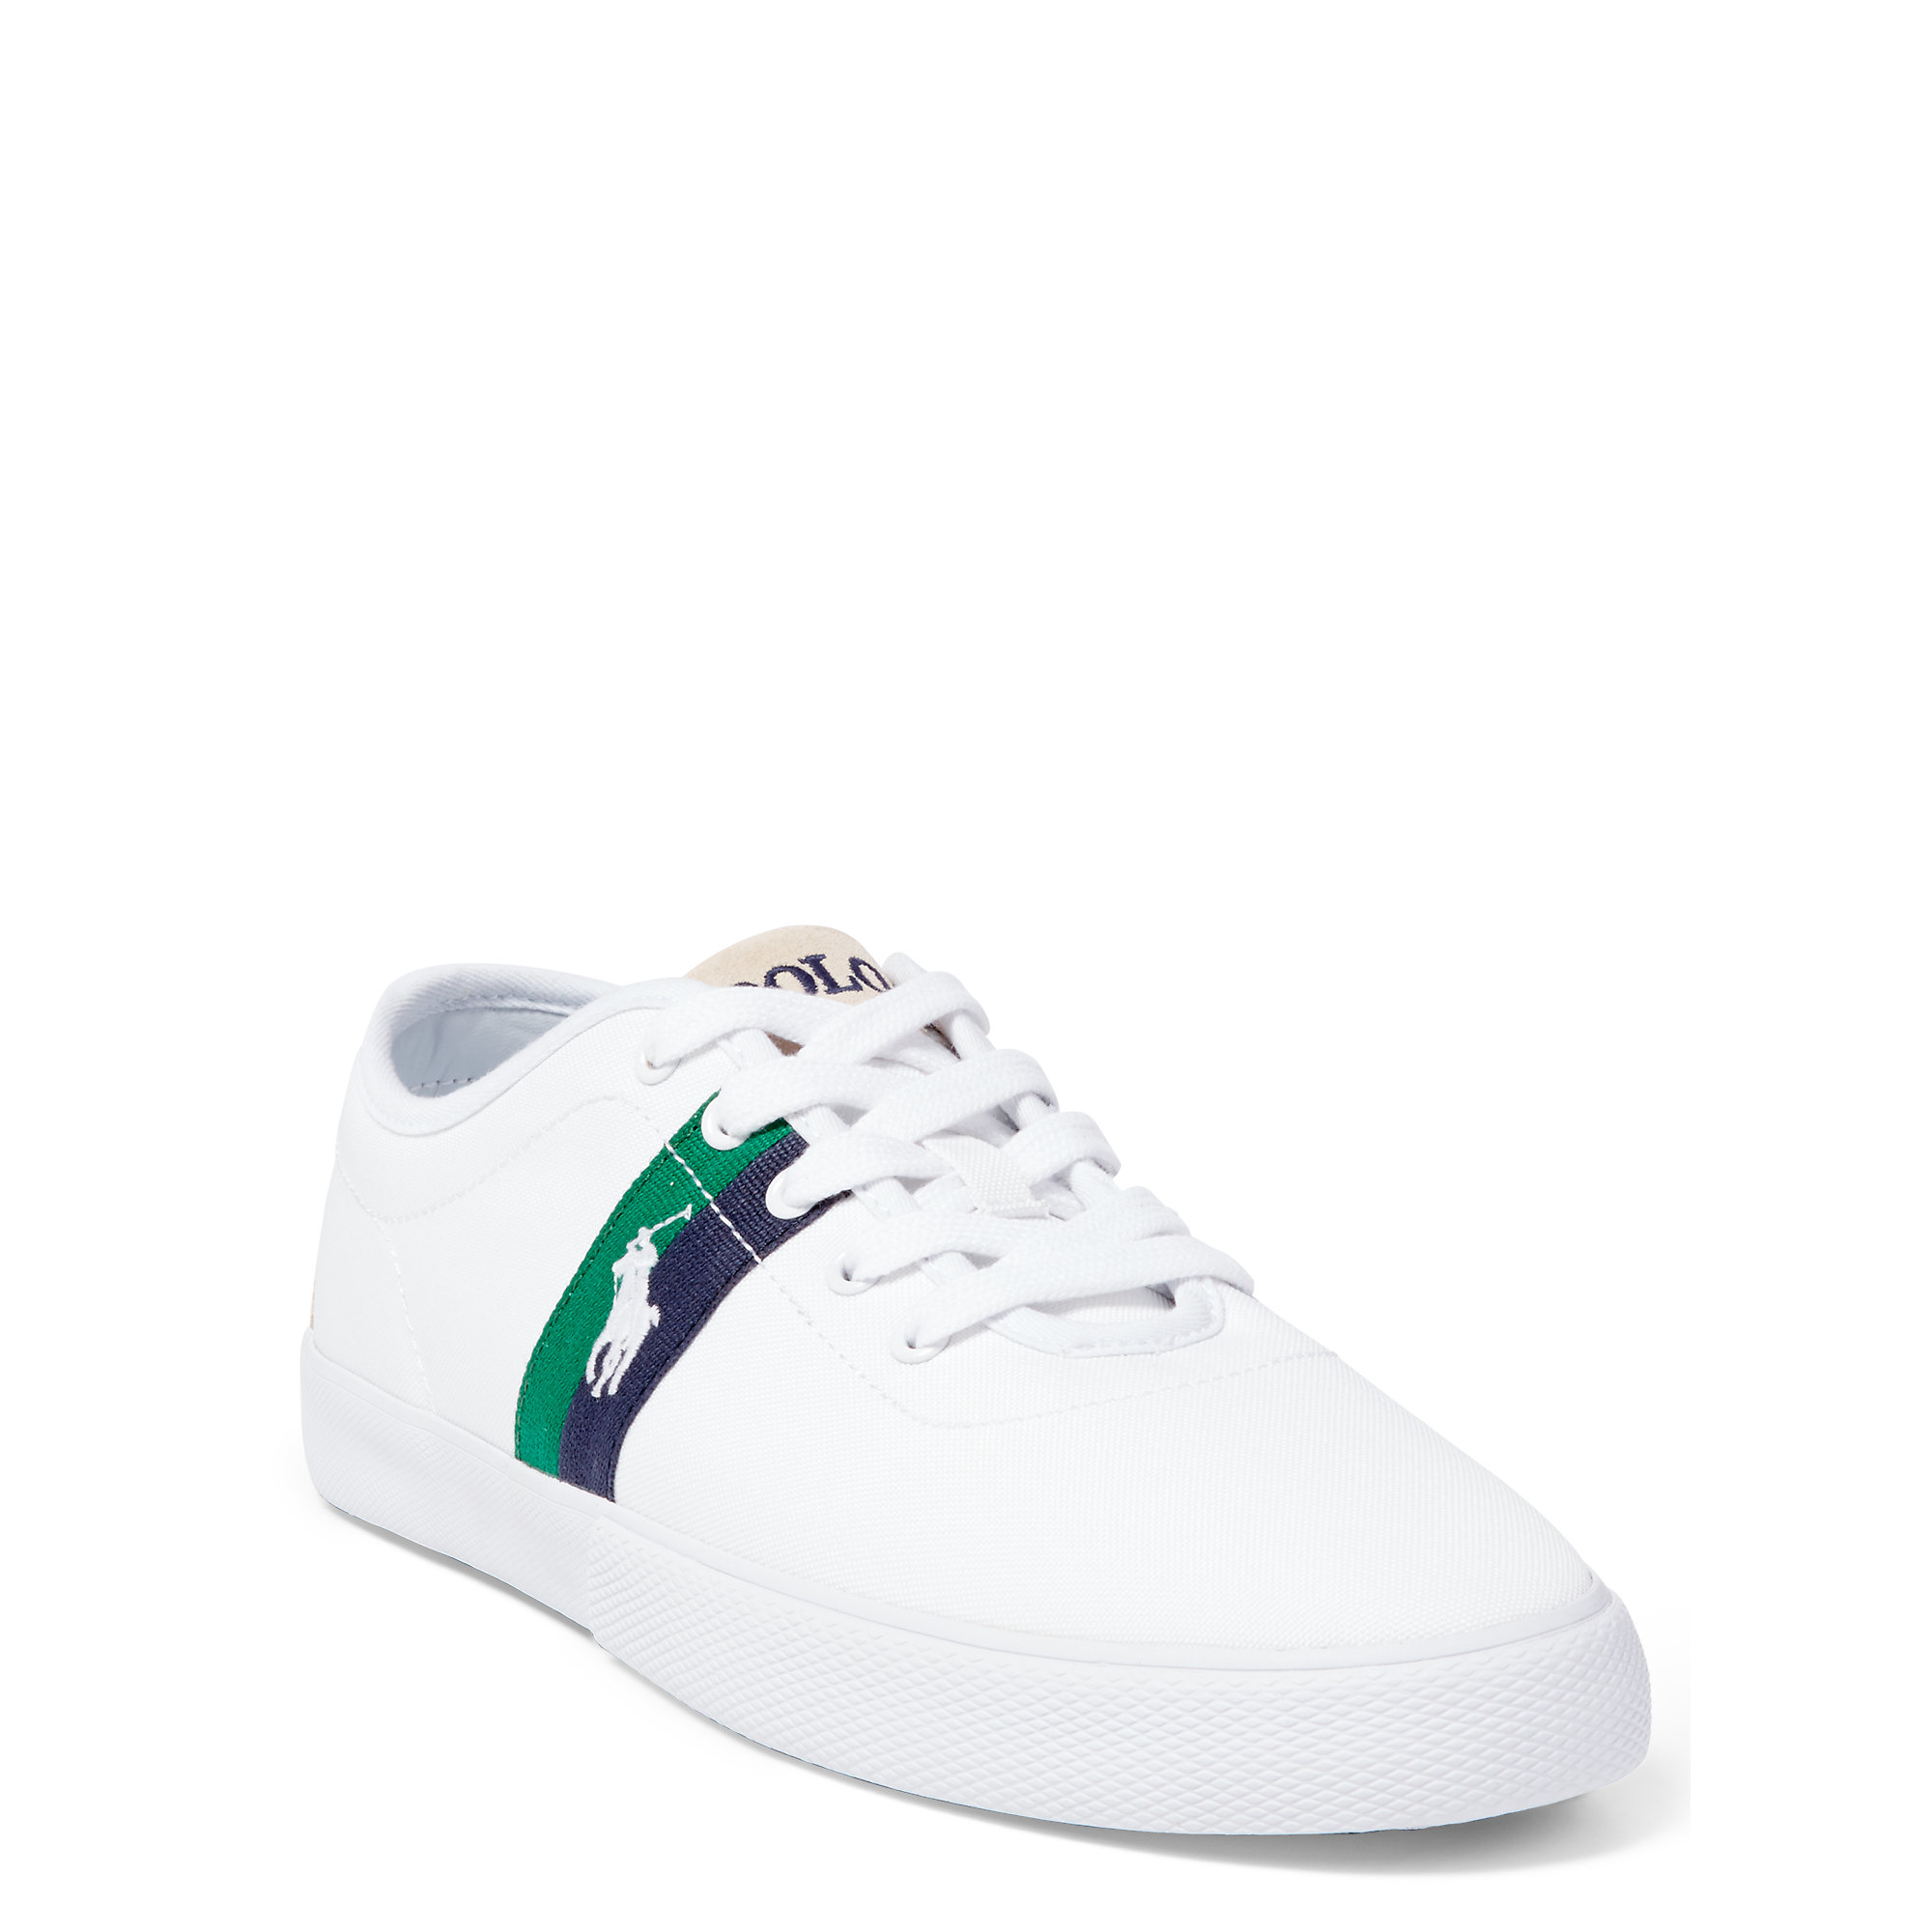 94be0773f1e2 Lyst - Polo Ralph Lauren Halford Cordura Canvas Sneaker in White for Men